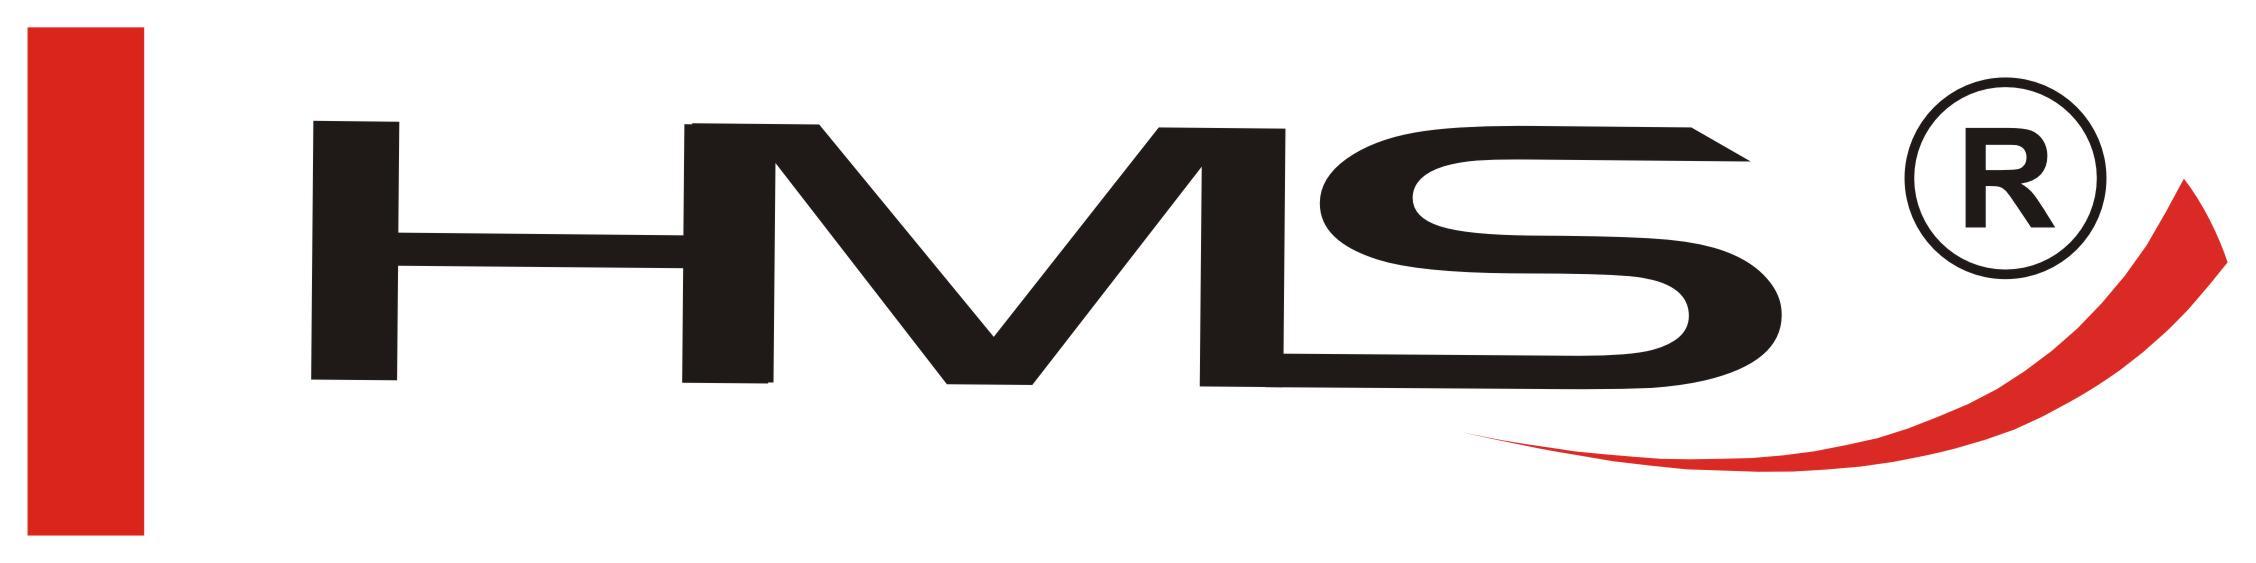 http://abisal.pl/wp-content/uploads/logo_hms.jpg